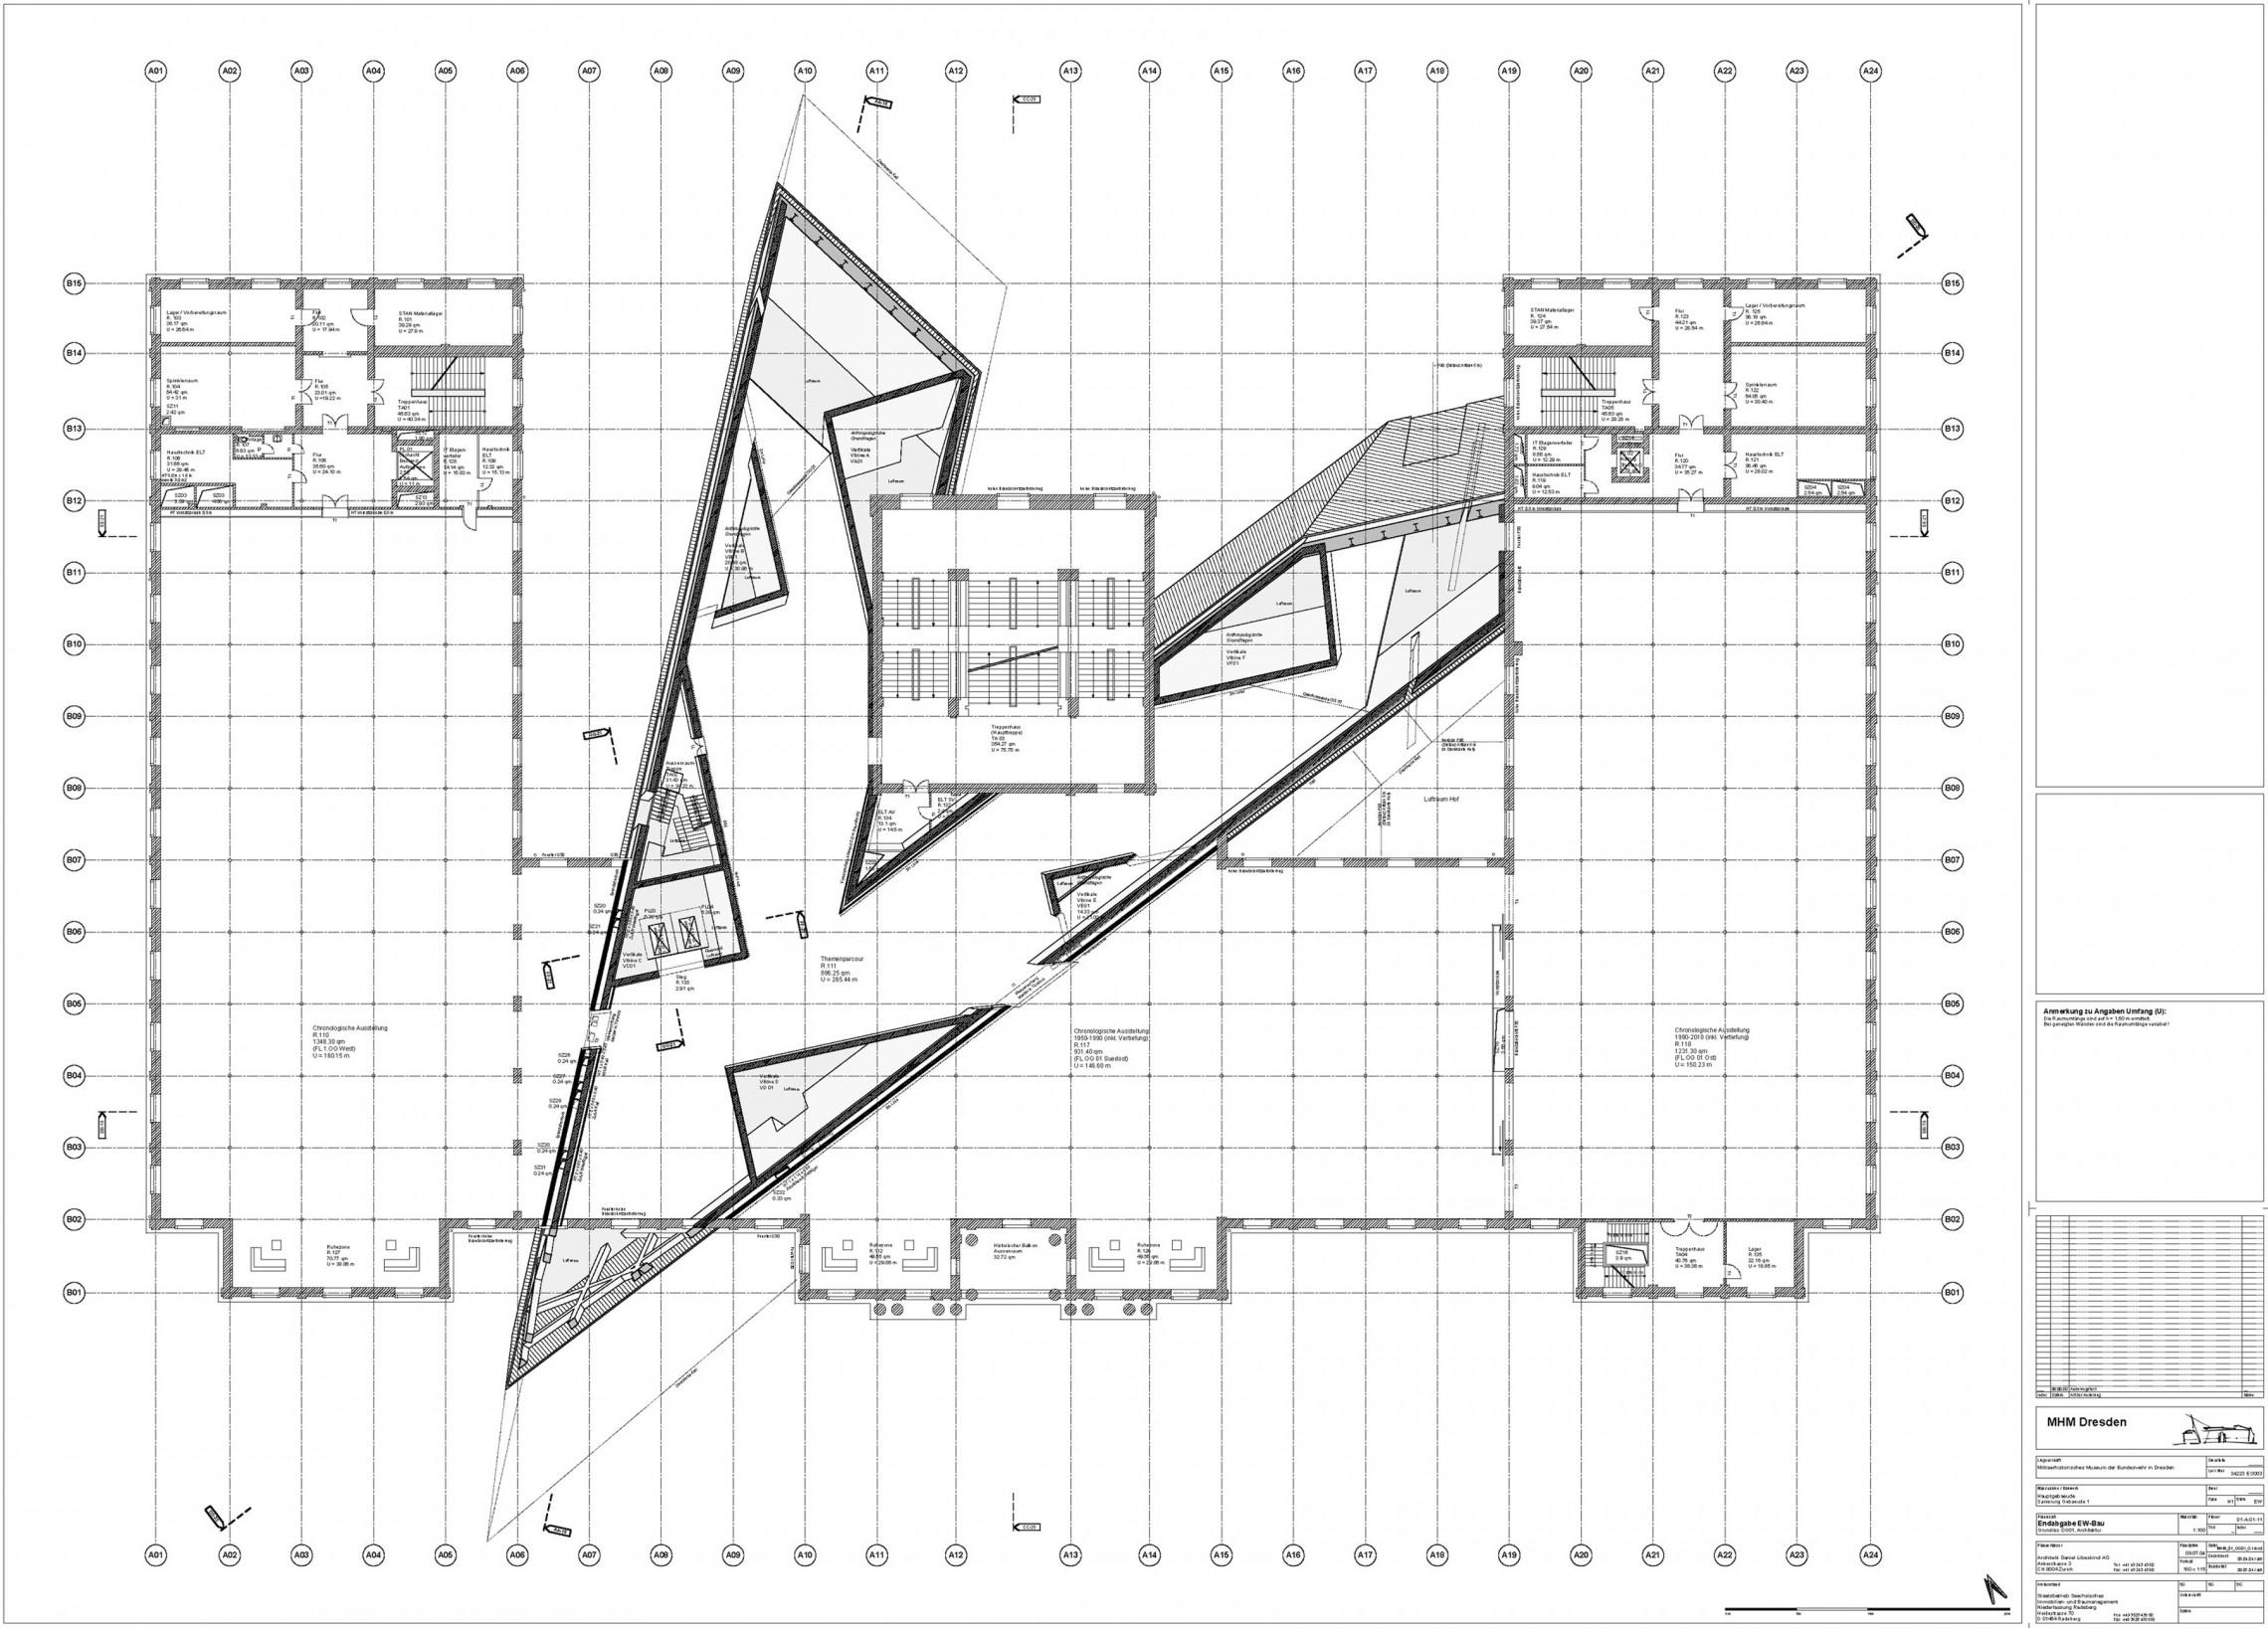 site planc studio daniel libeskind 2280x1637